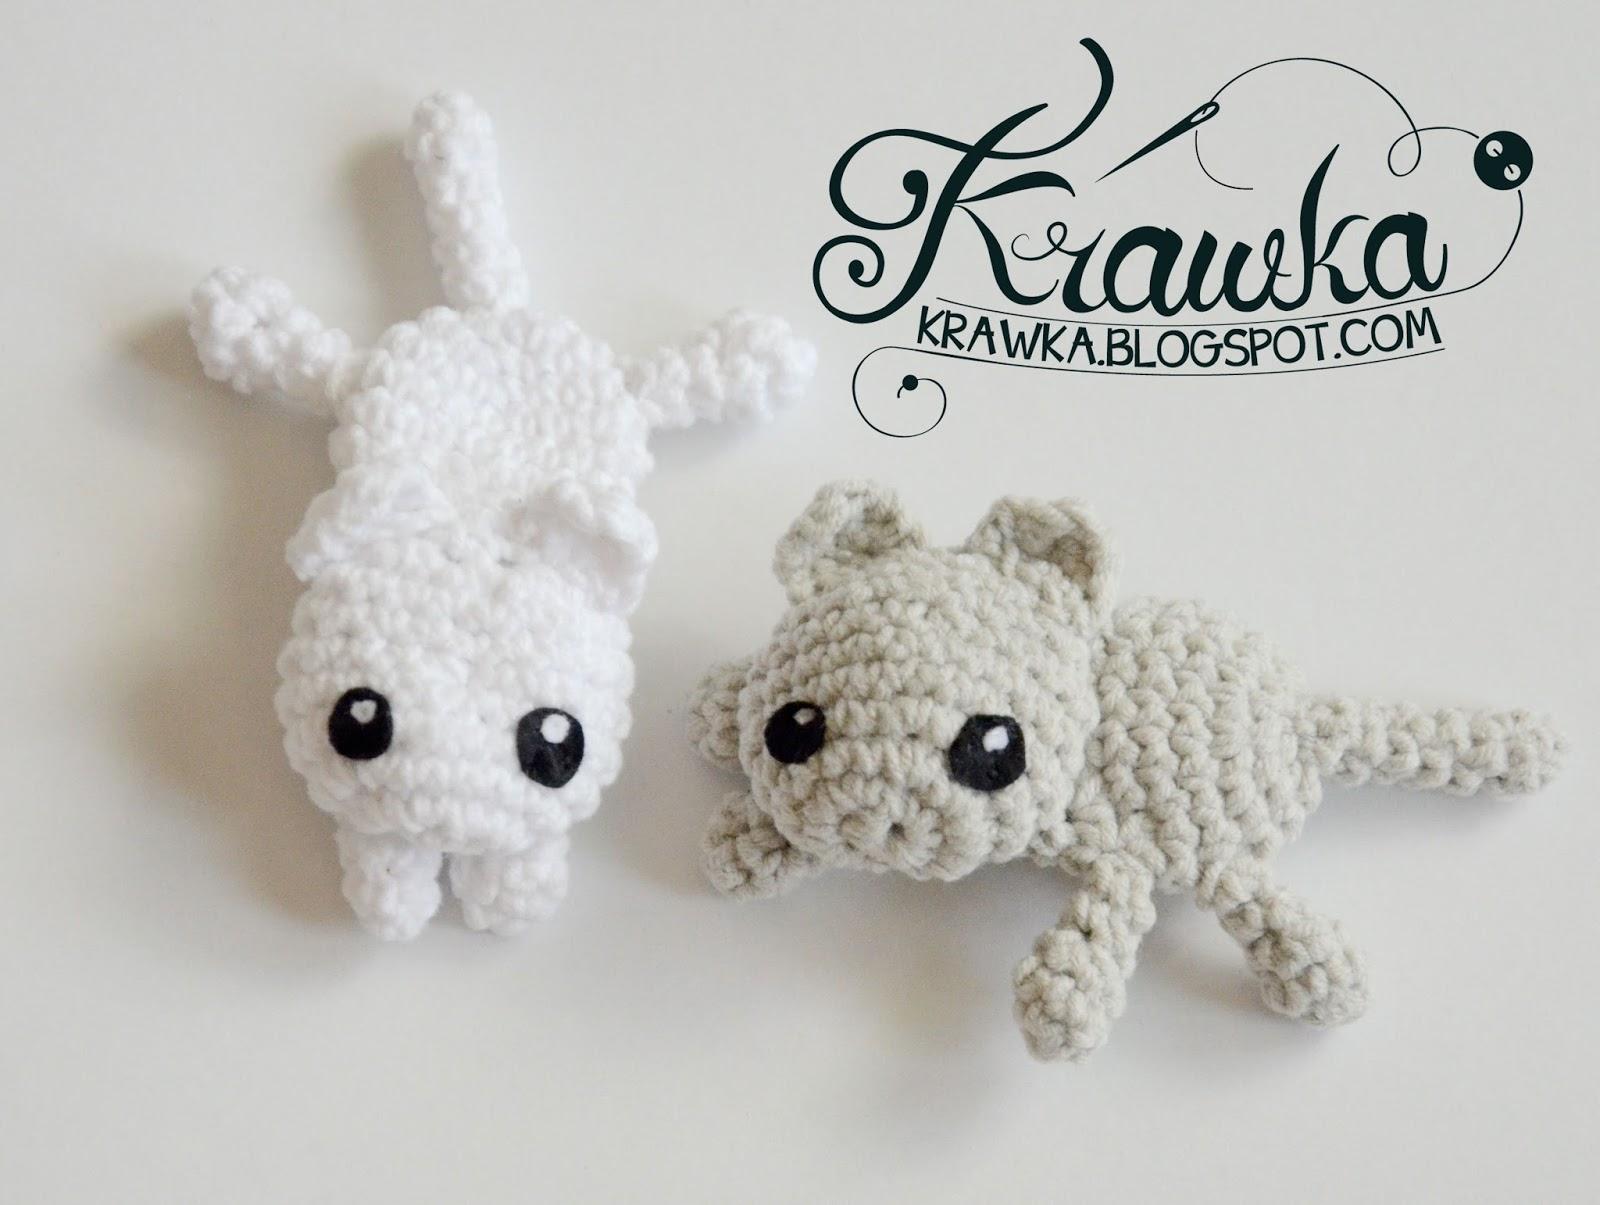 Krawka: Grey cat / White cat